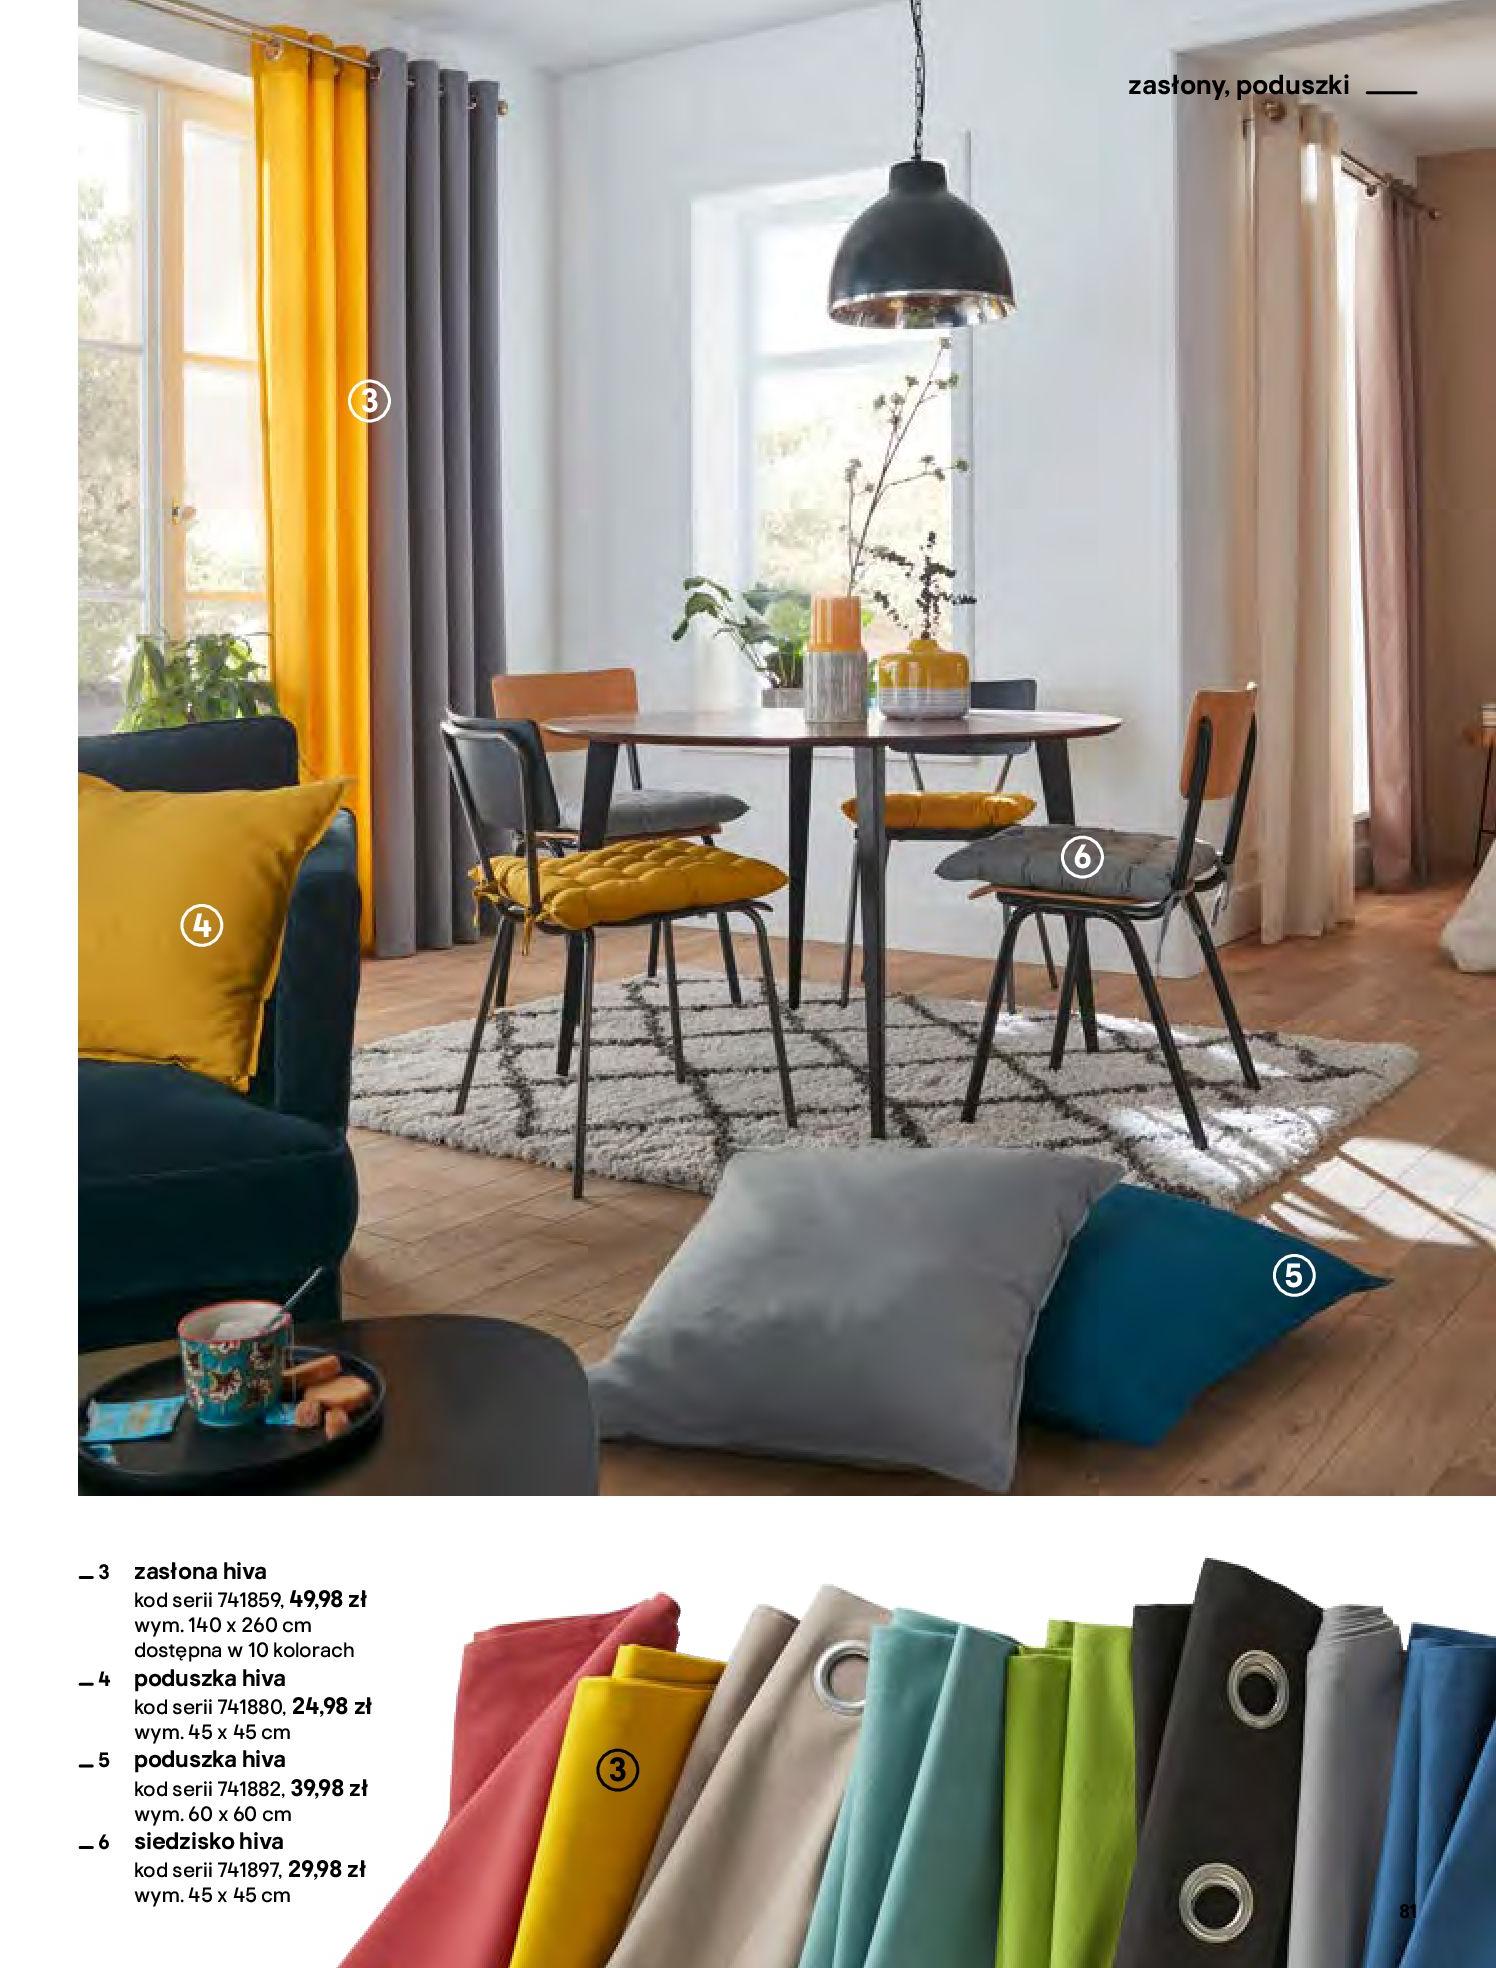 Gazetka Castorama - Katalog Dekoracje-22.10.2020-31.12.2020-page-81